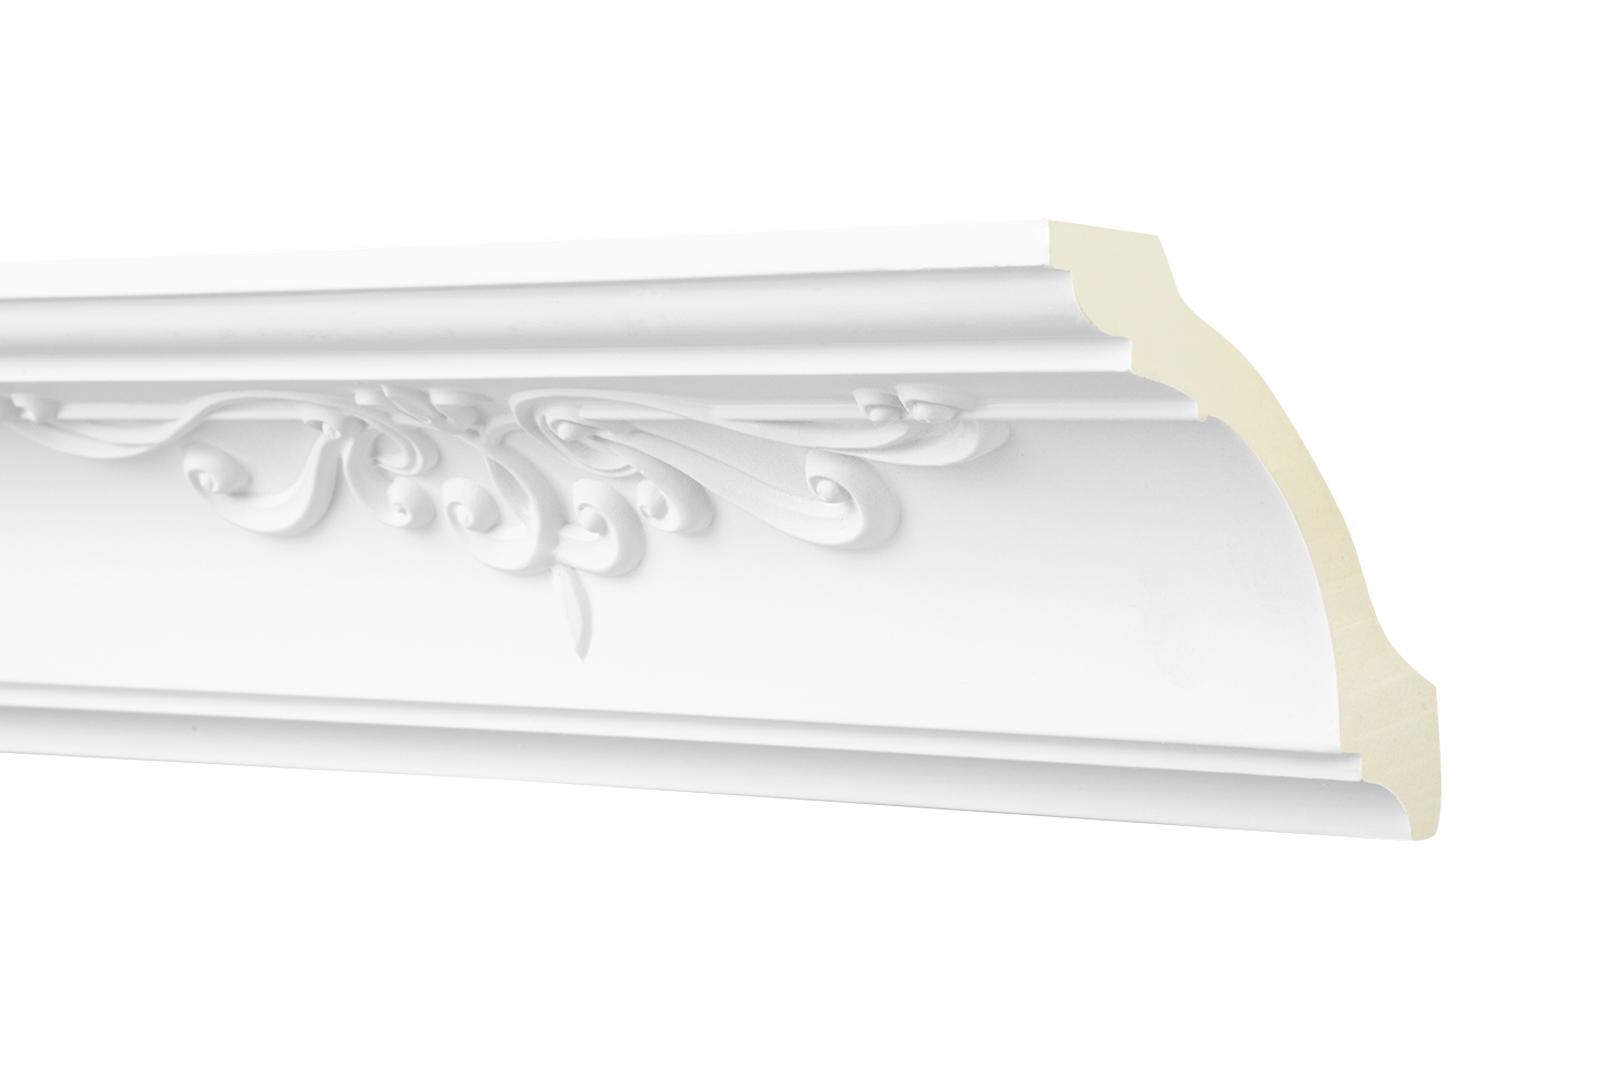 2 Meter Zierprofil 90x90mm - Stuckleiste aus PU gemustert, stoßfest - Perfect AA326